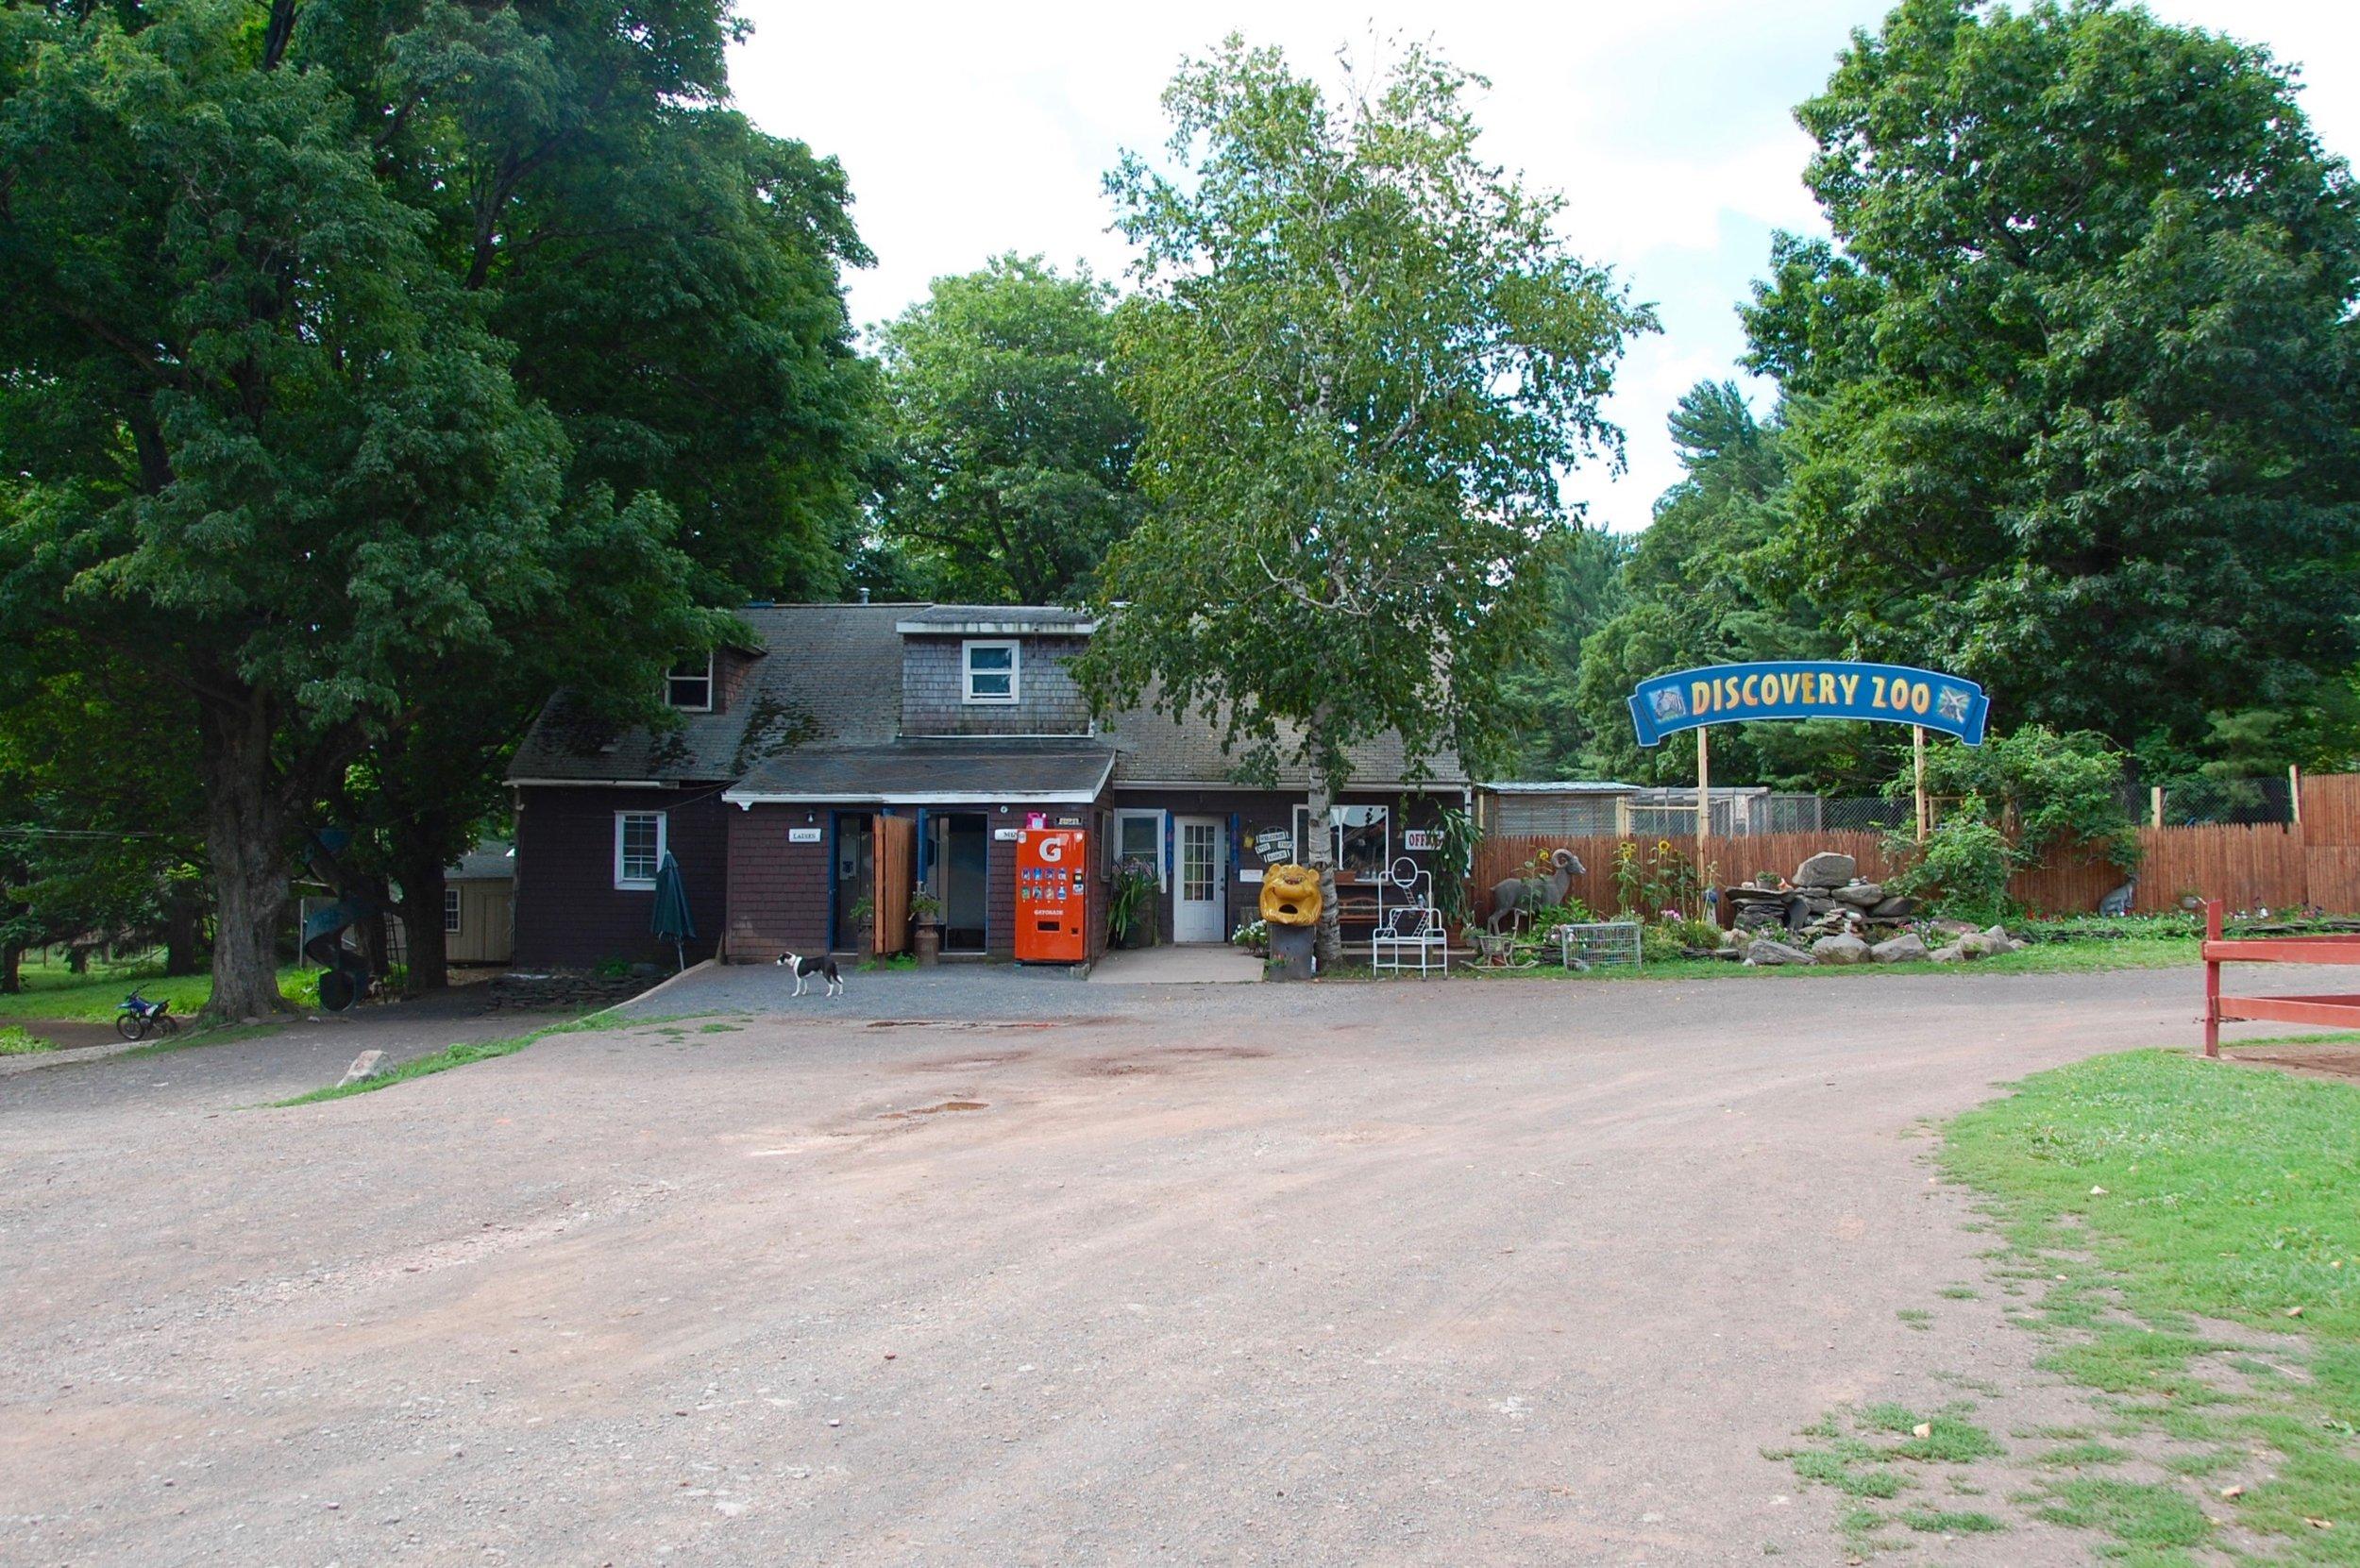 Bailiwick Ranch Discovery Zoo